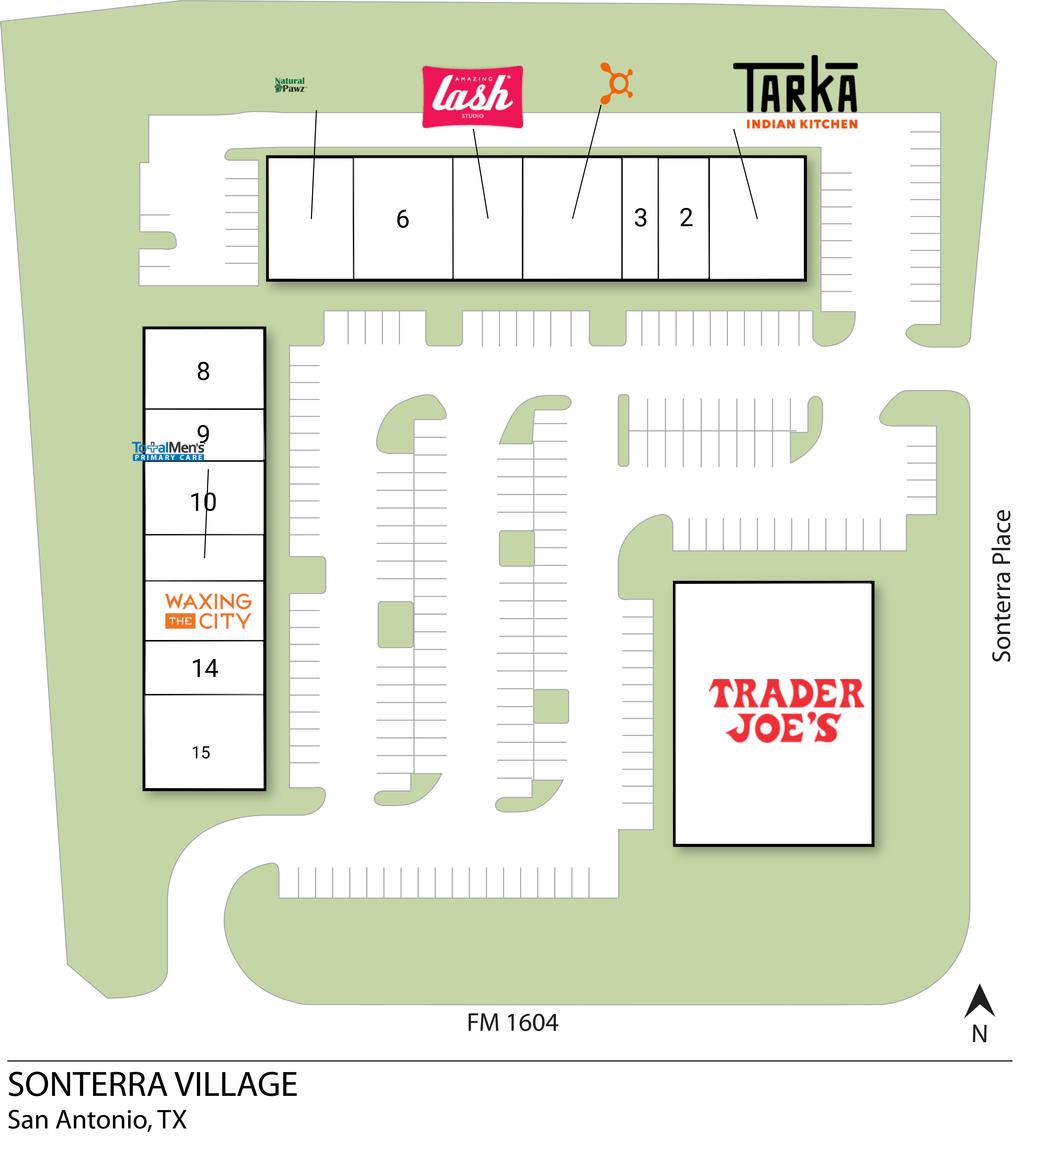 San Antonio Tx Sonterra Village  Retail Space  Inventrust